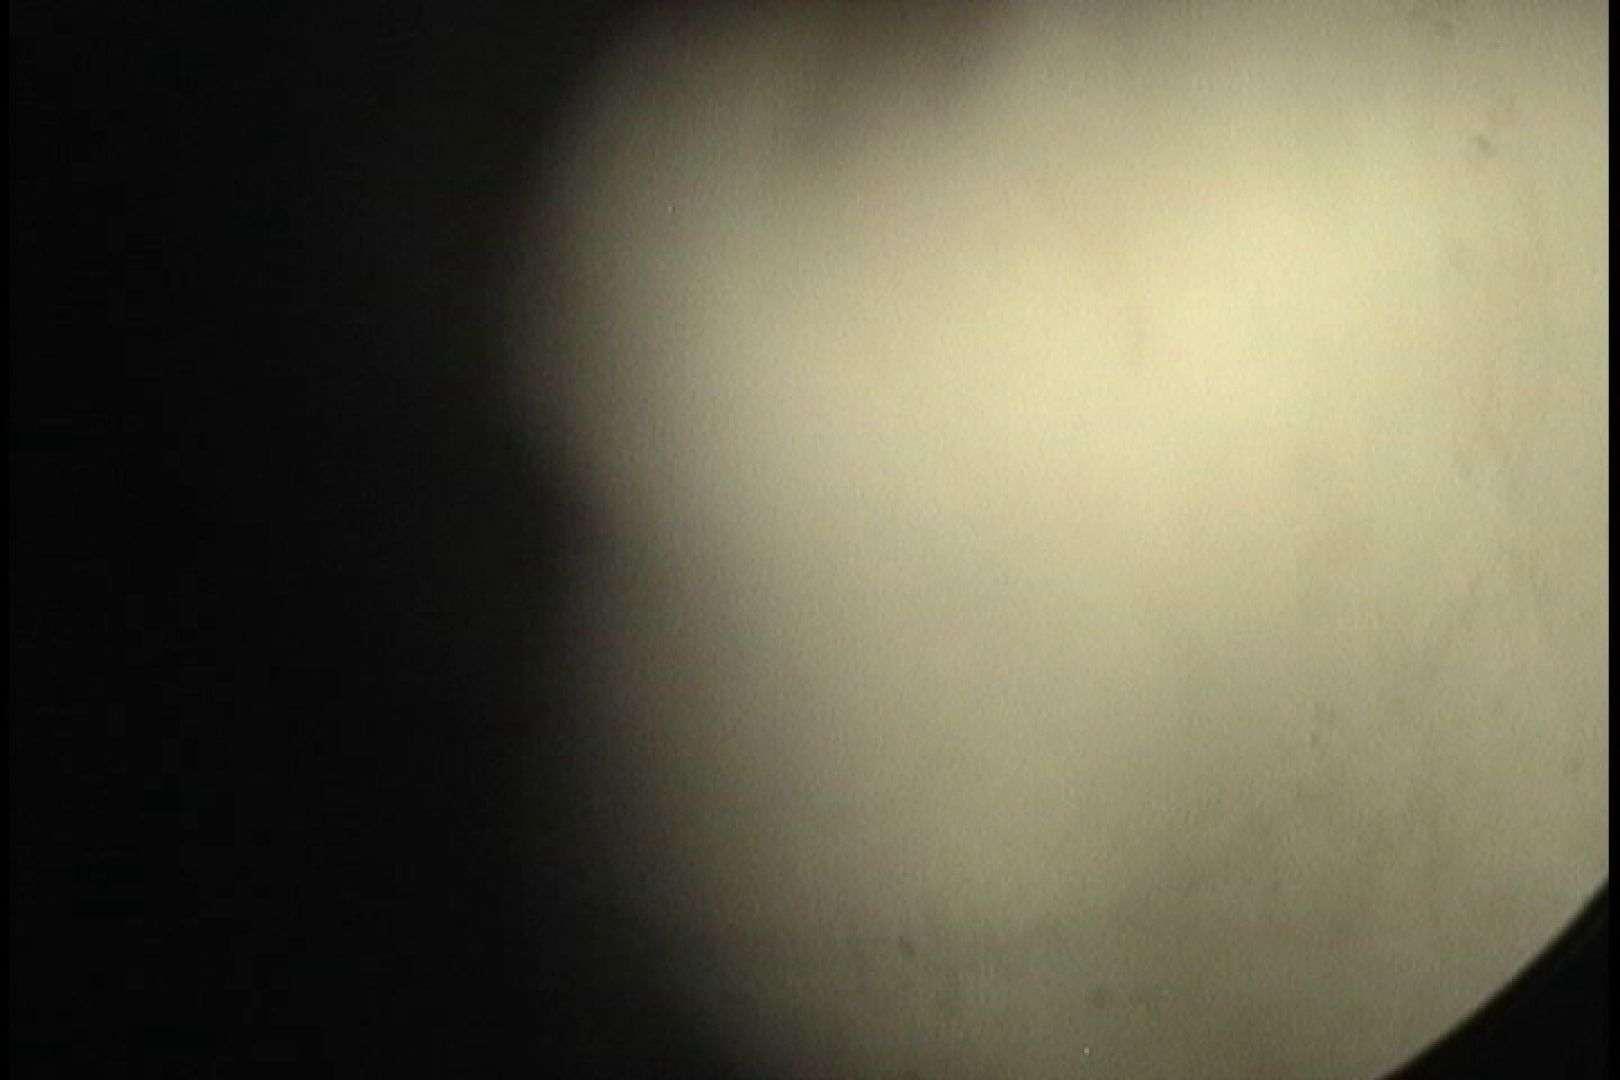 No.34 おわん型オッパイのてっぺんに淡いピンクの乳首ちゃん 綺麗な乙女 ワレメ動画紹介 71連発 47